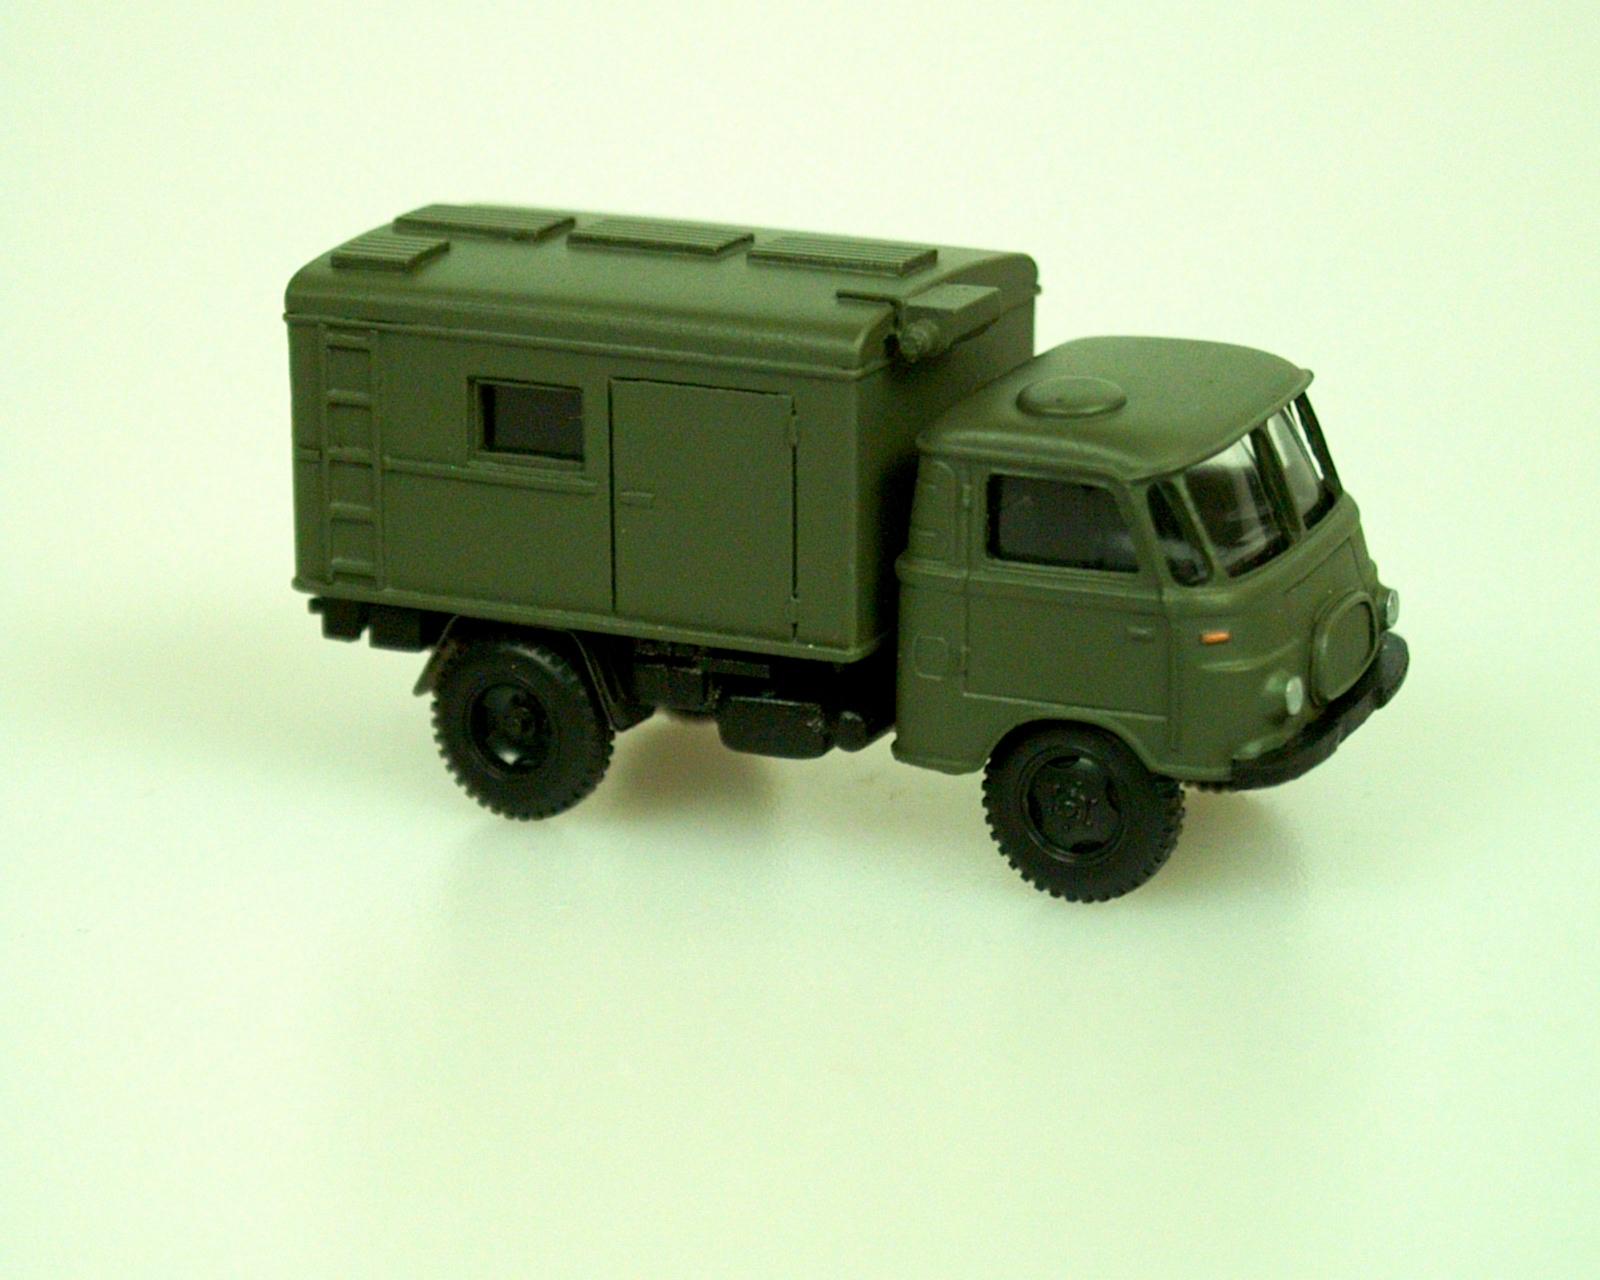 1964 Robur Lo1800A KdoW/KTW (Military)